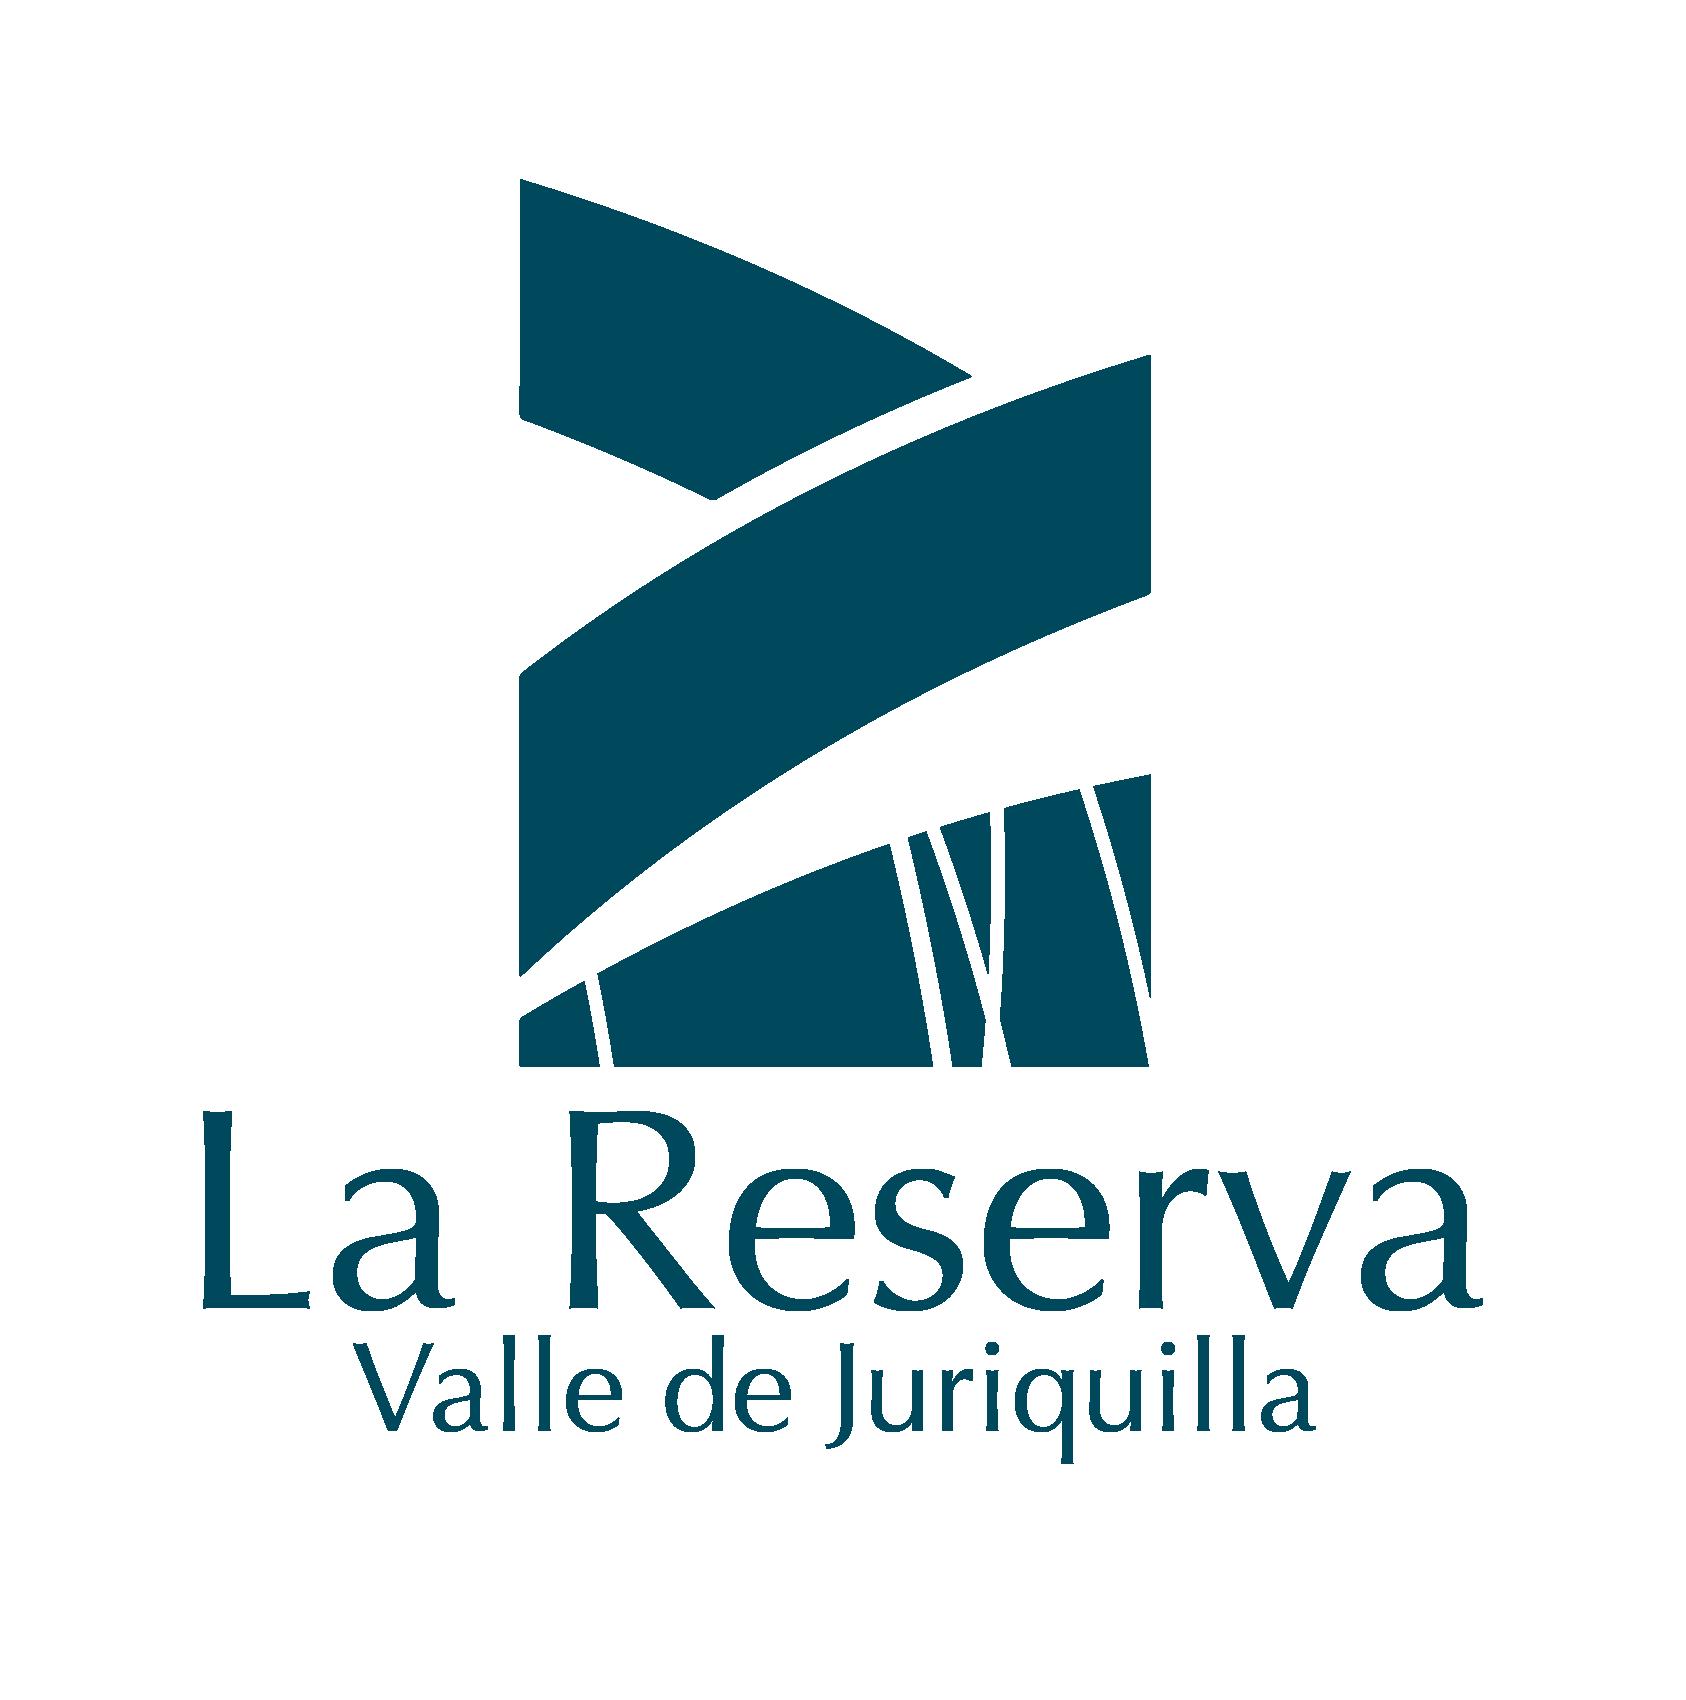 La Reserva Valle de Juriquilla